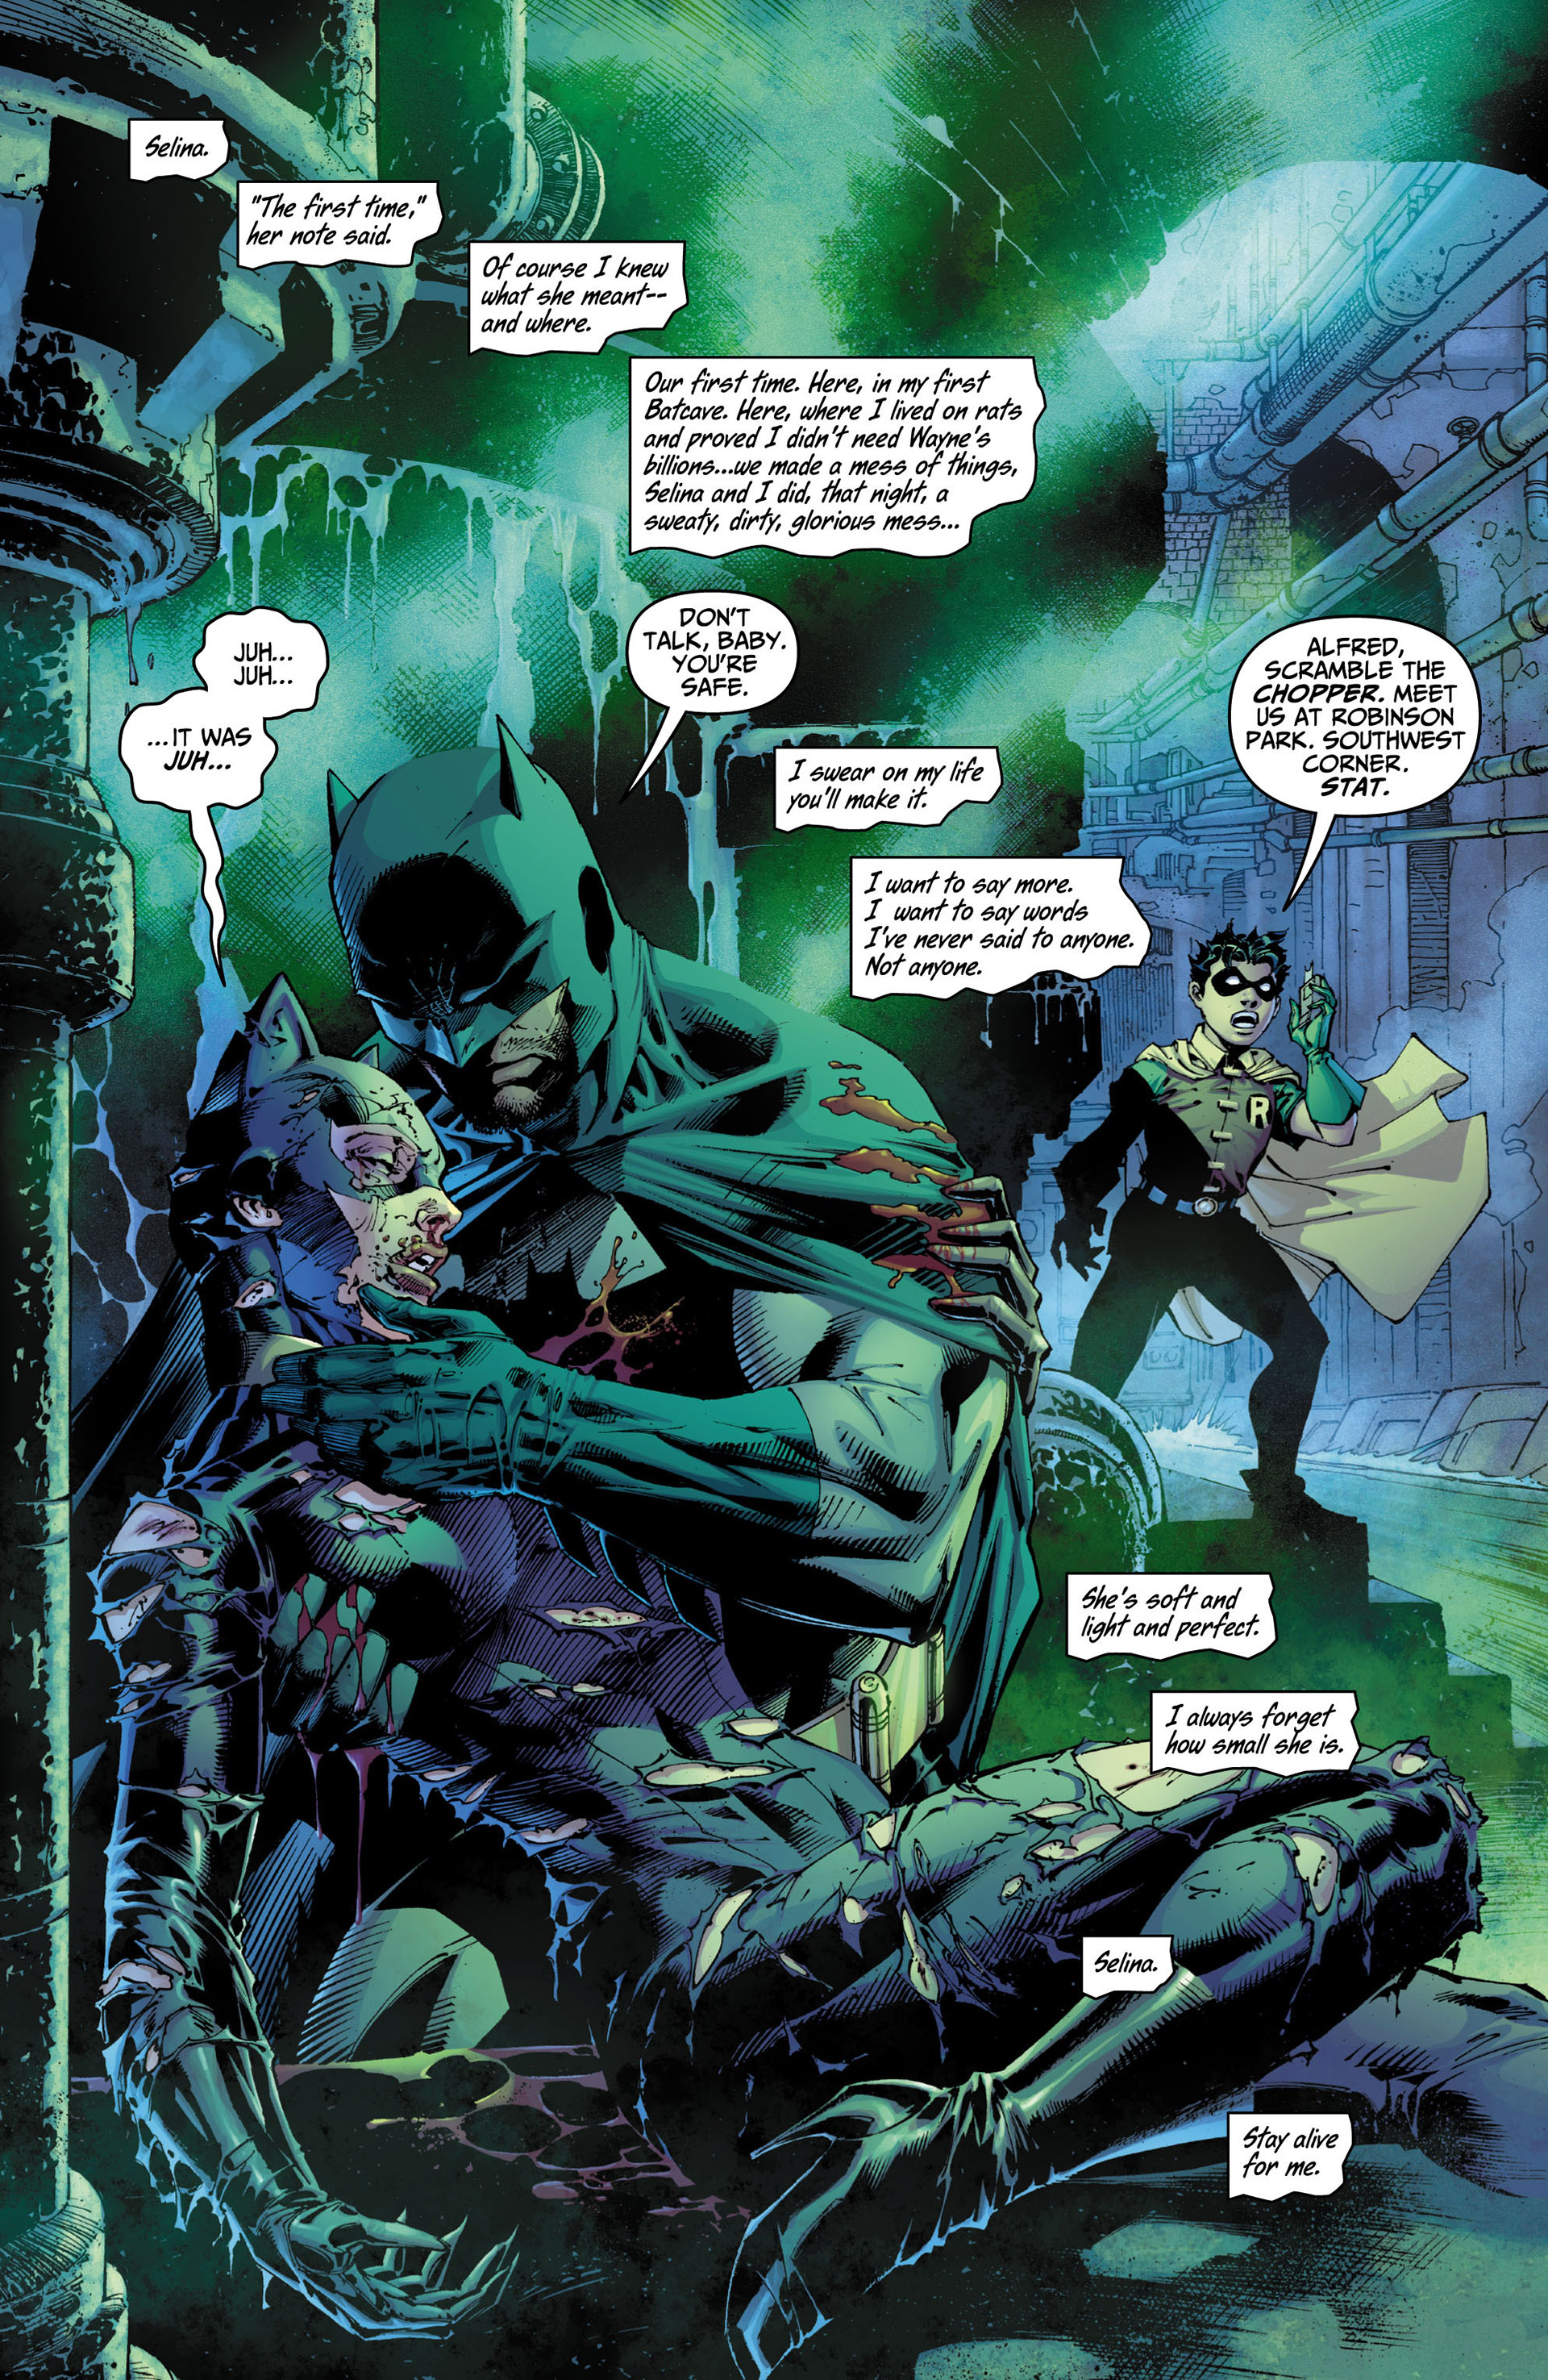 Read online All Star Batman & Robin, The Boy Wonder comic -  Issue #10 - 12